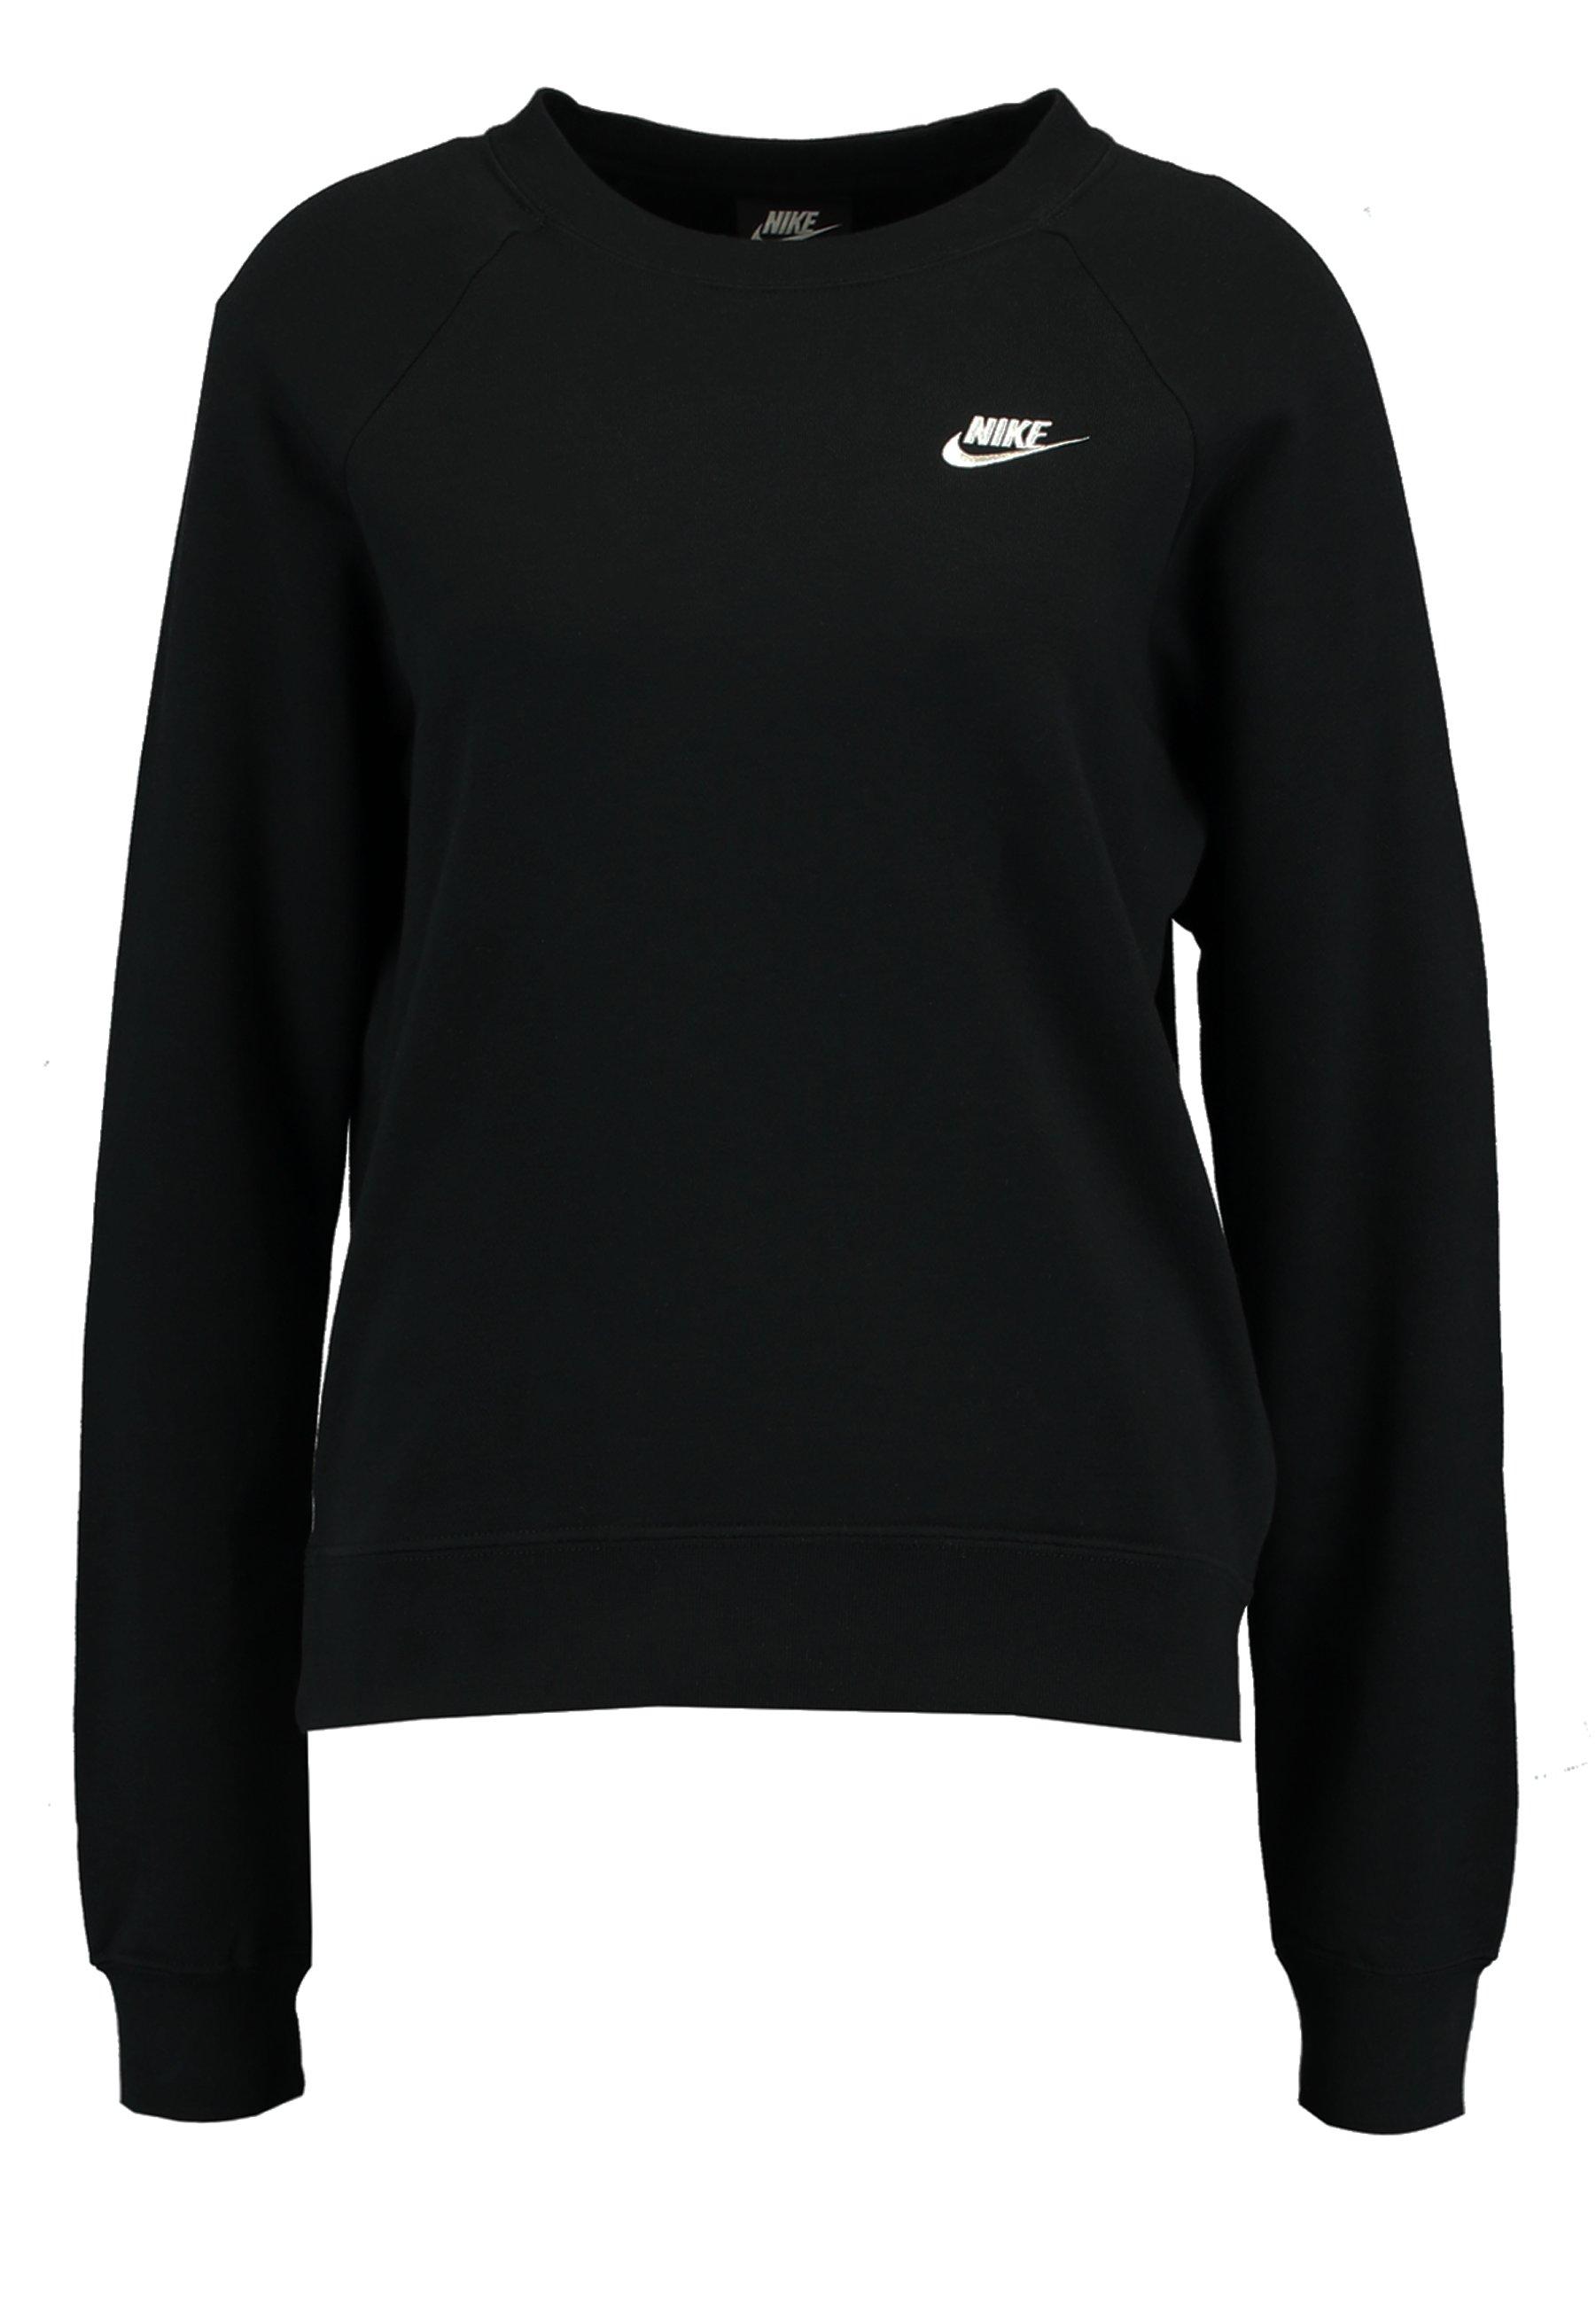 Nike Sportswear Crew - Sweatshirt Black/white